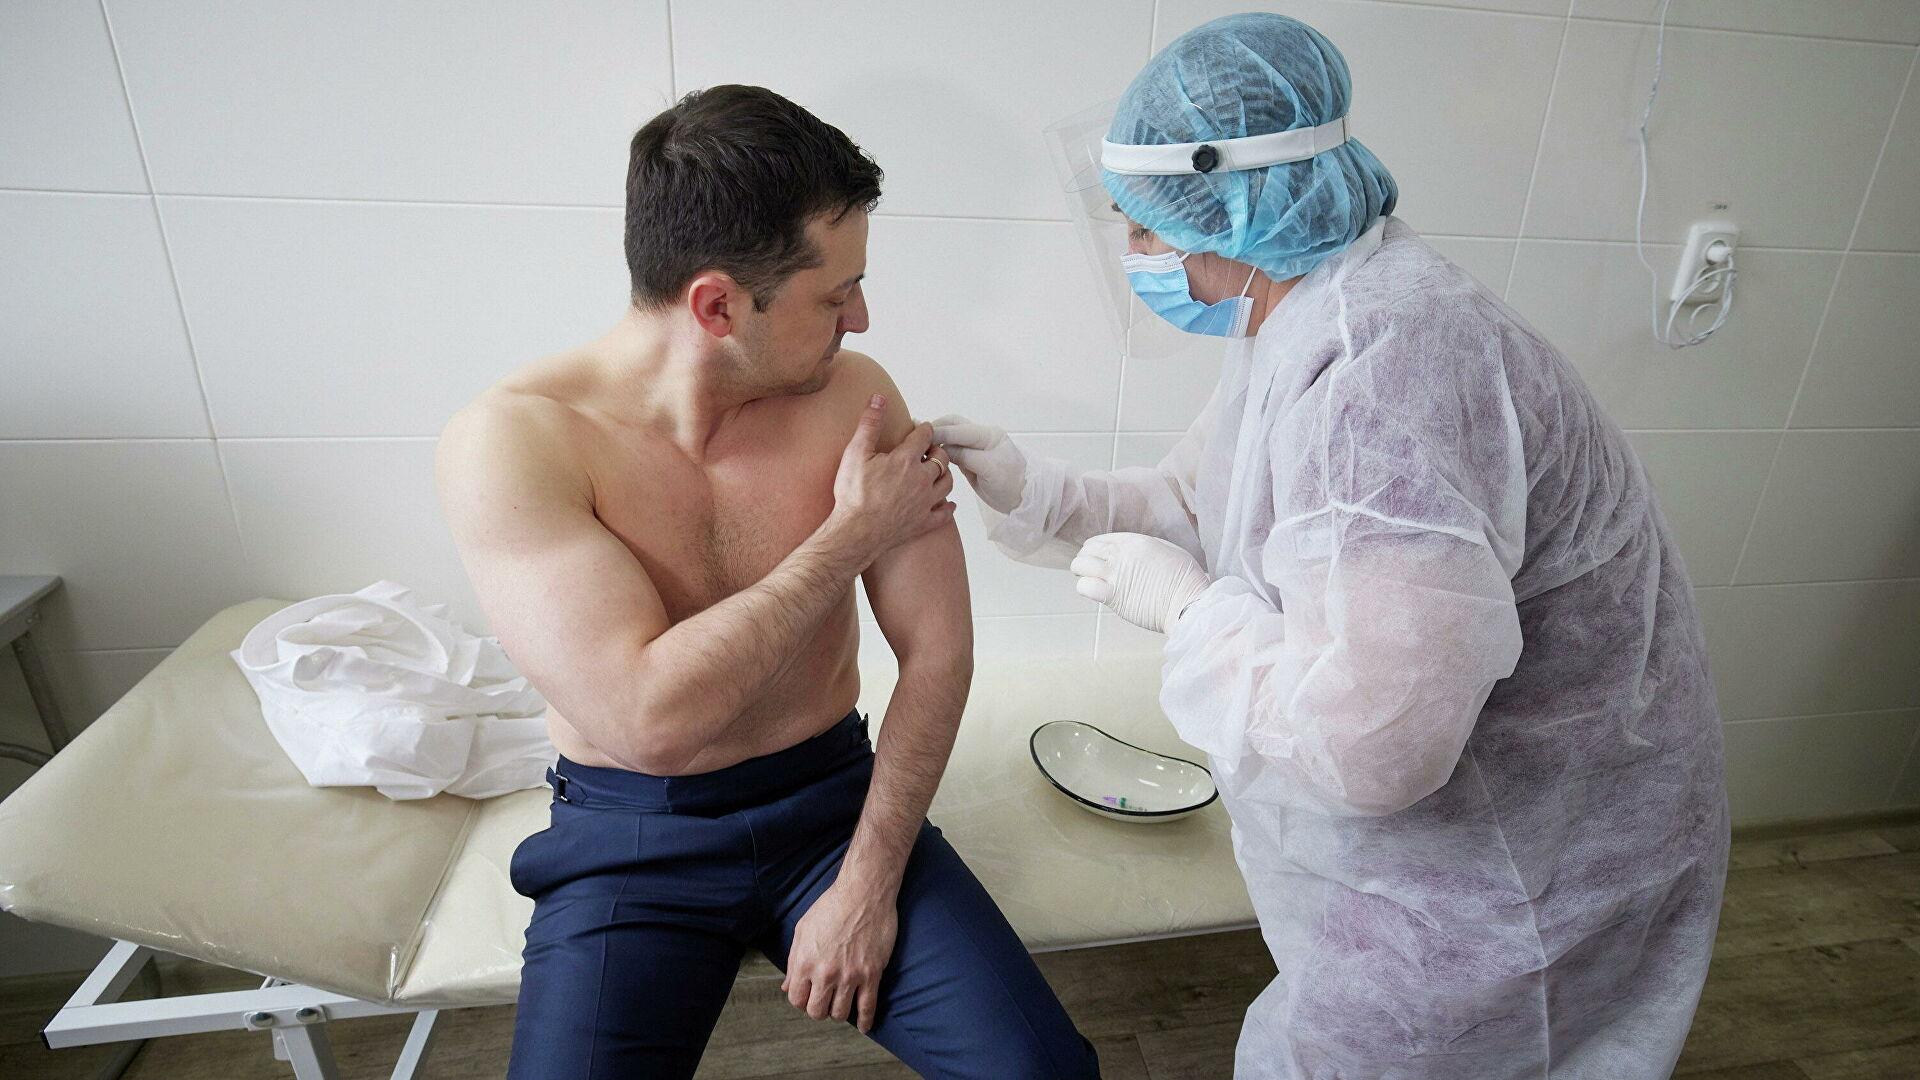 Зеленский сделал прививку от коронавируса | Прихист